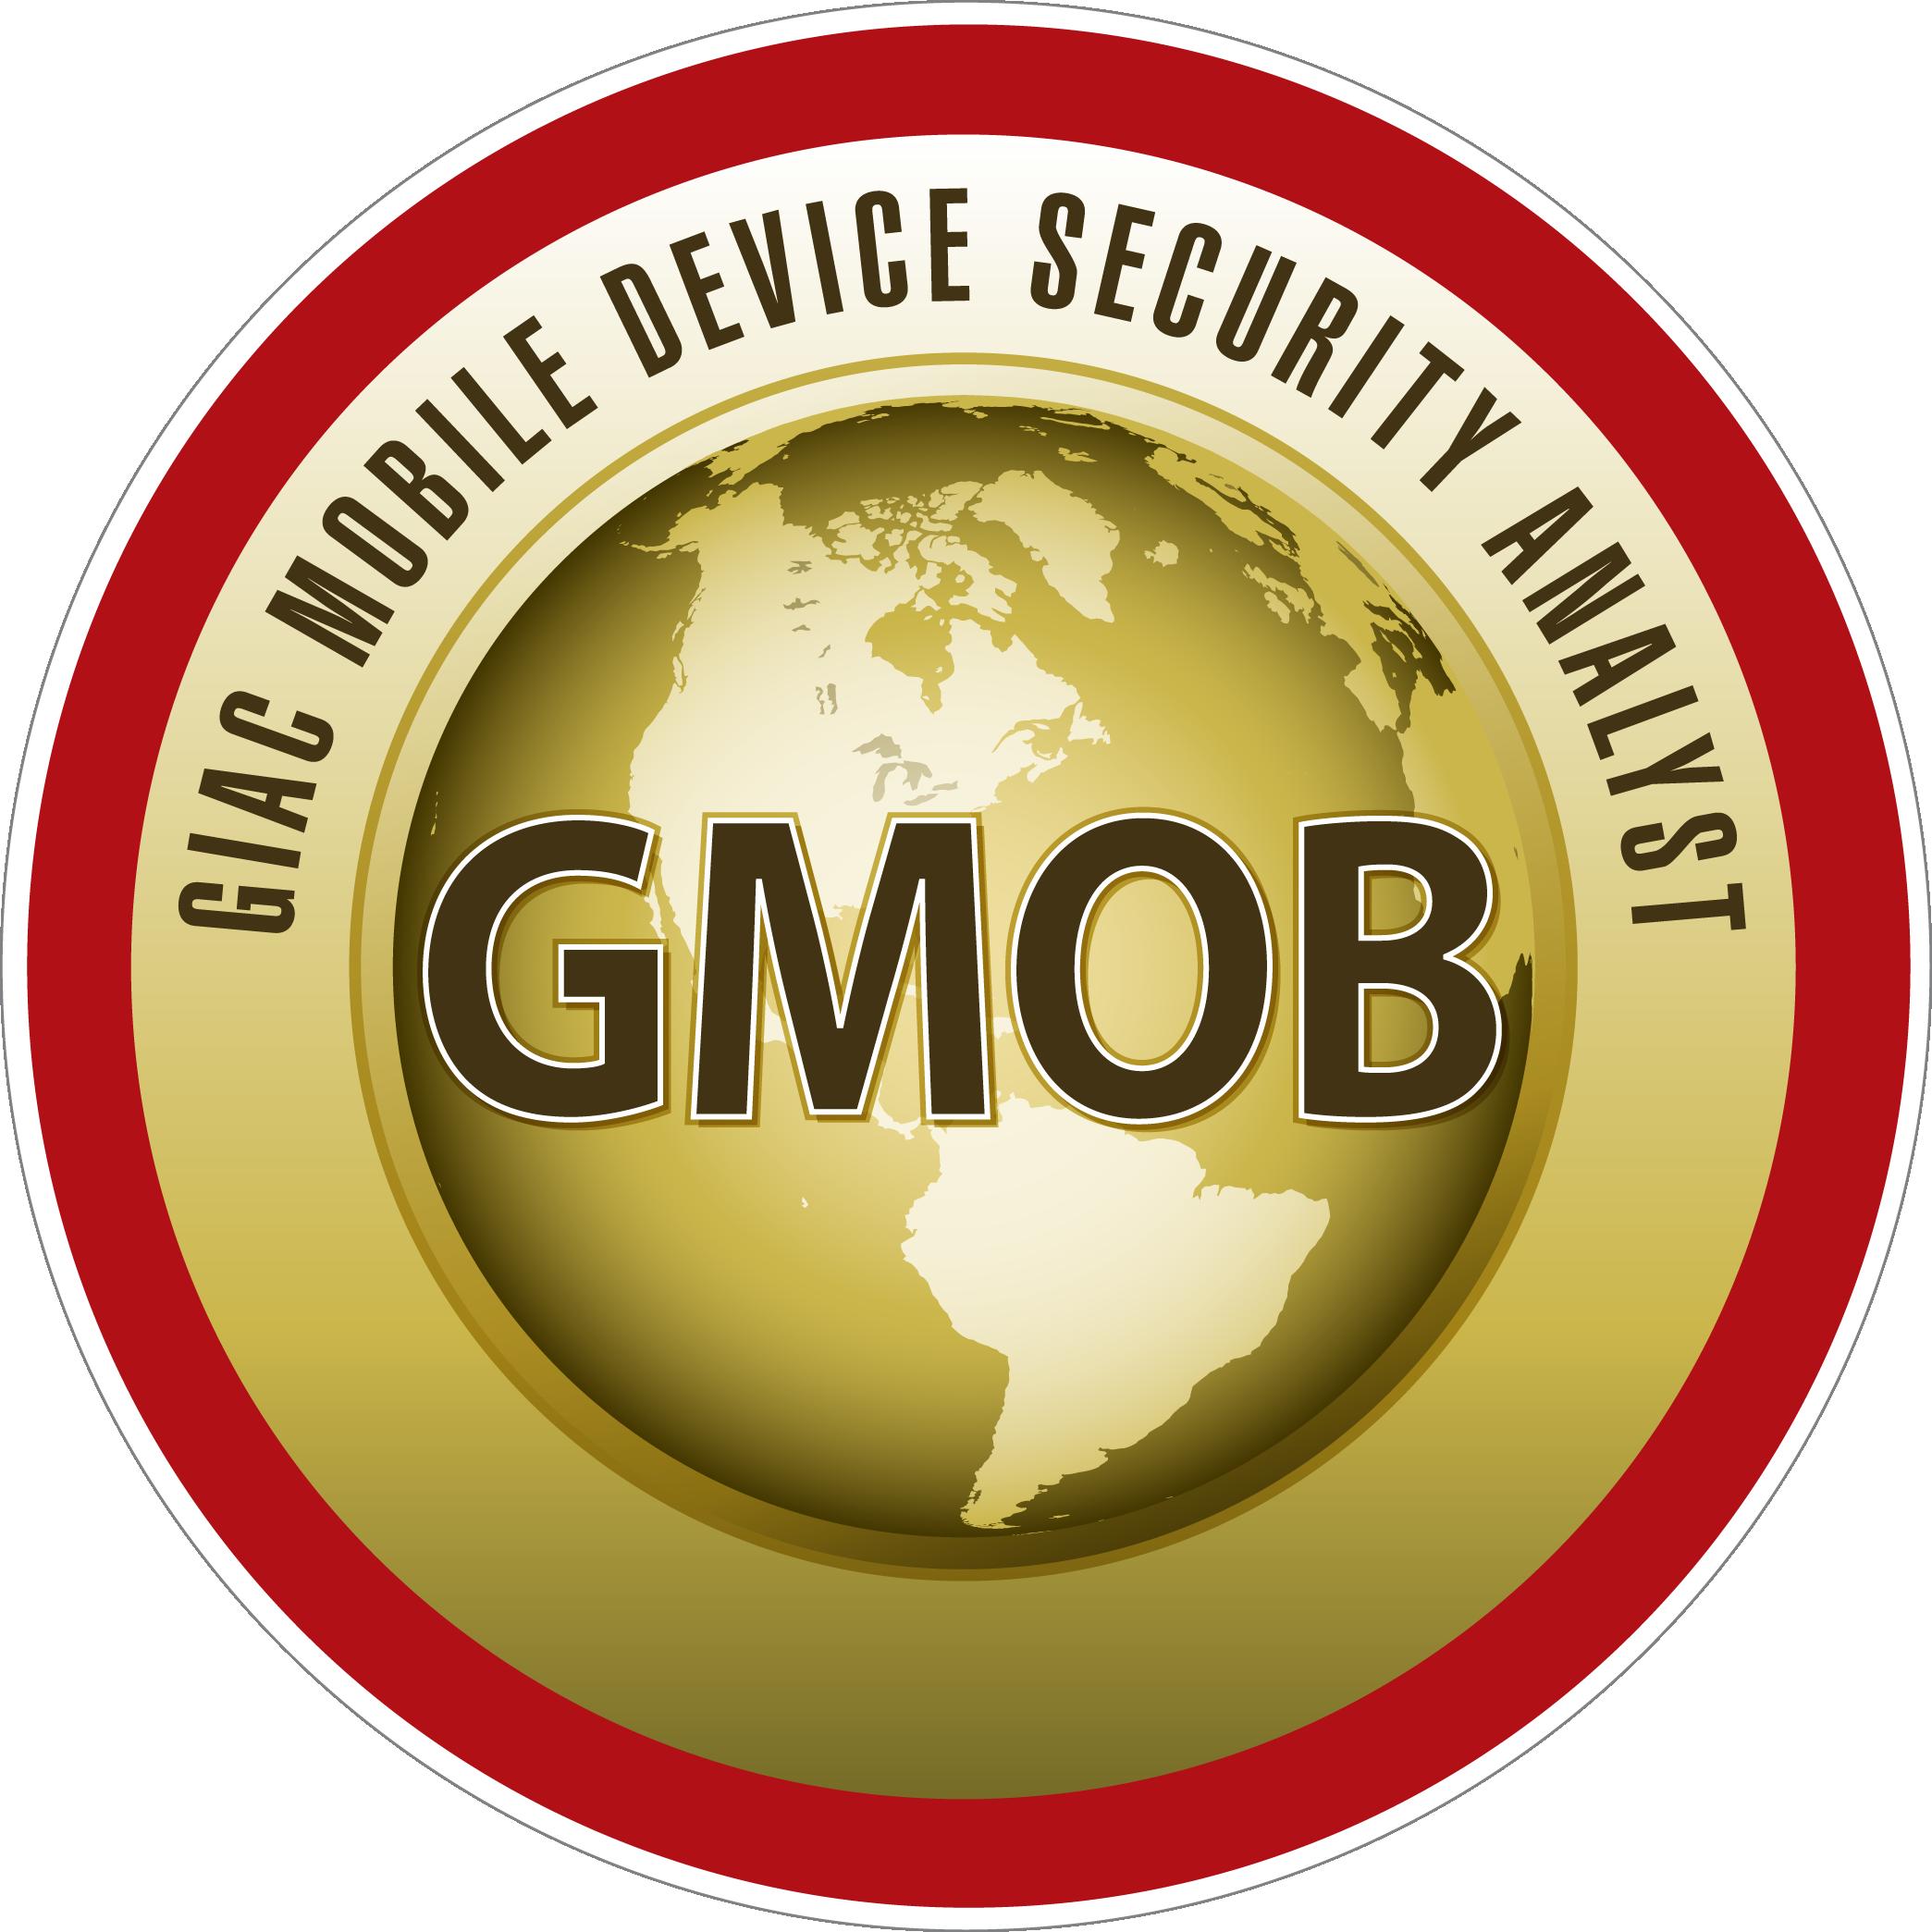 GIAC Mobile Device Security Analyst (GMOB) icon